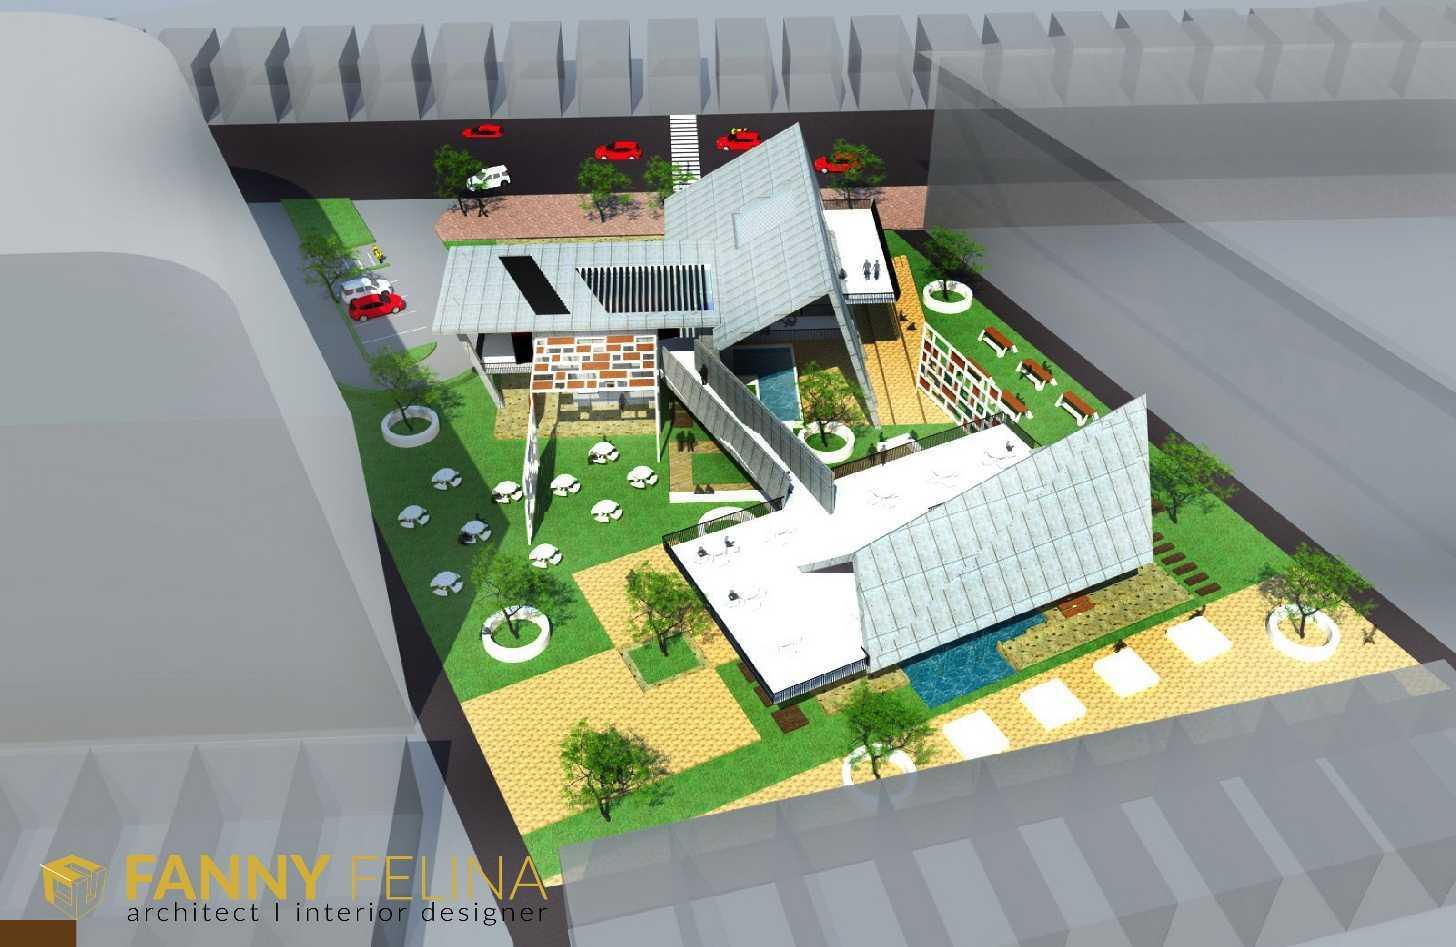 Fanny Felina Architecture & Interior Design Community Photography Gallery Surabaya, Surabaya City, East Java, Indonesia Surabaya, Surabaya City, East Java, Indonesia 04 Kontemporer,modern  35351